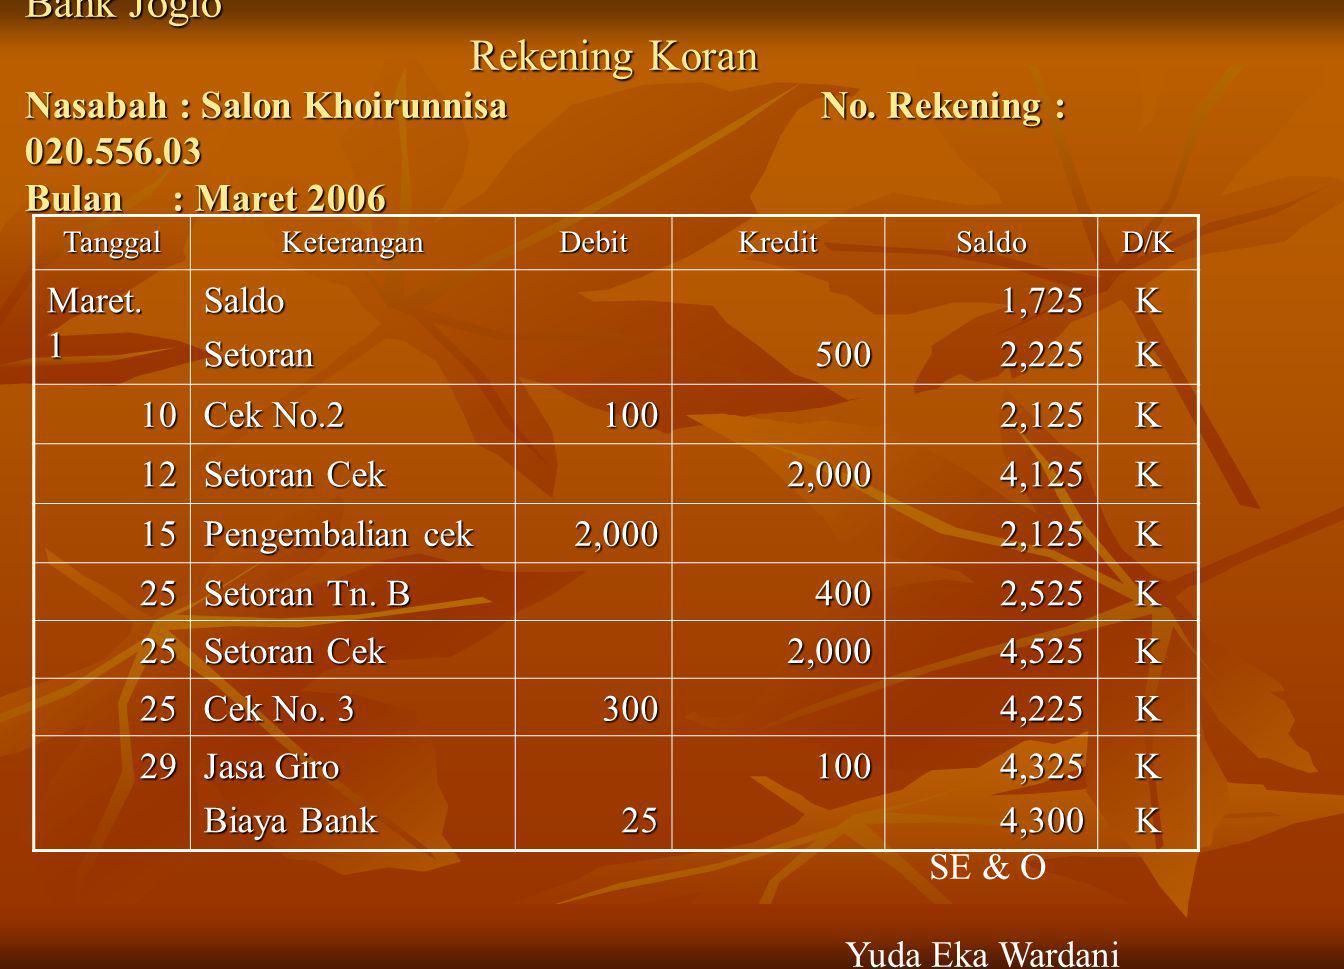 Bank Joglo Rekening Koran Nasabah : Salon Khoirunnisa No.